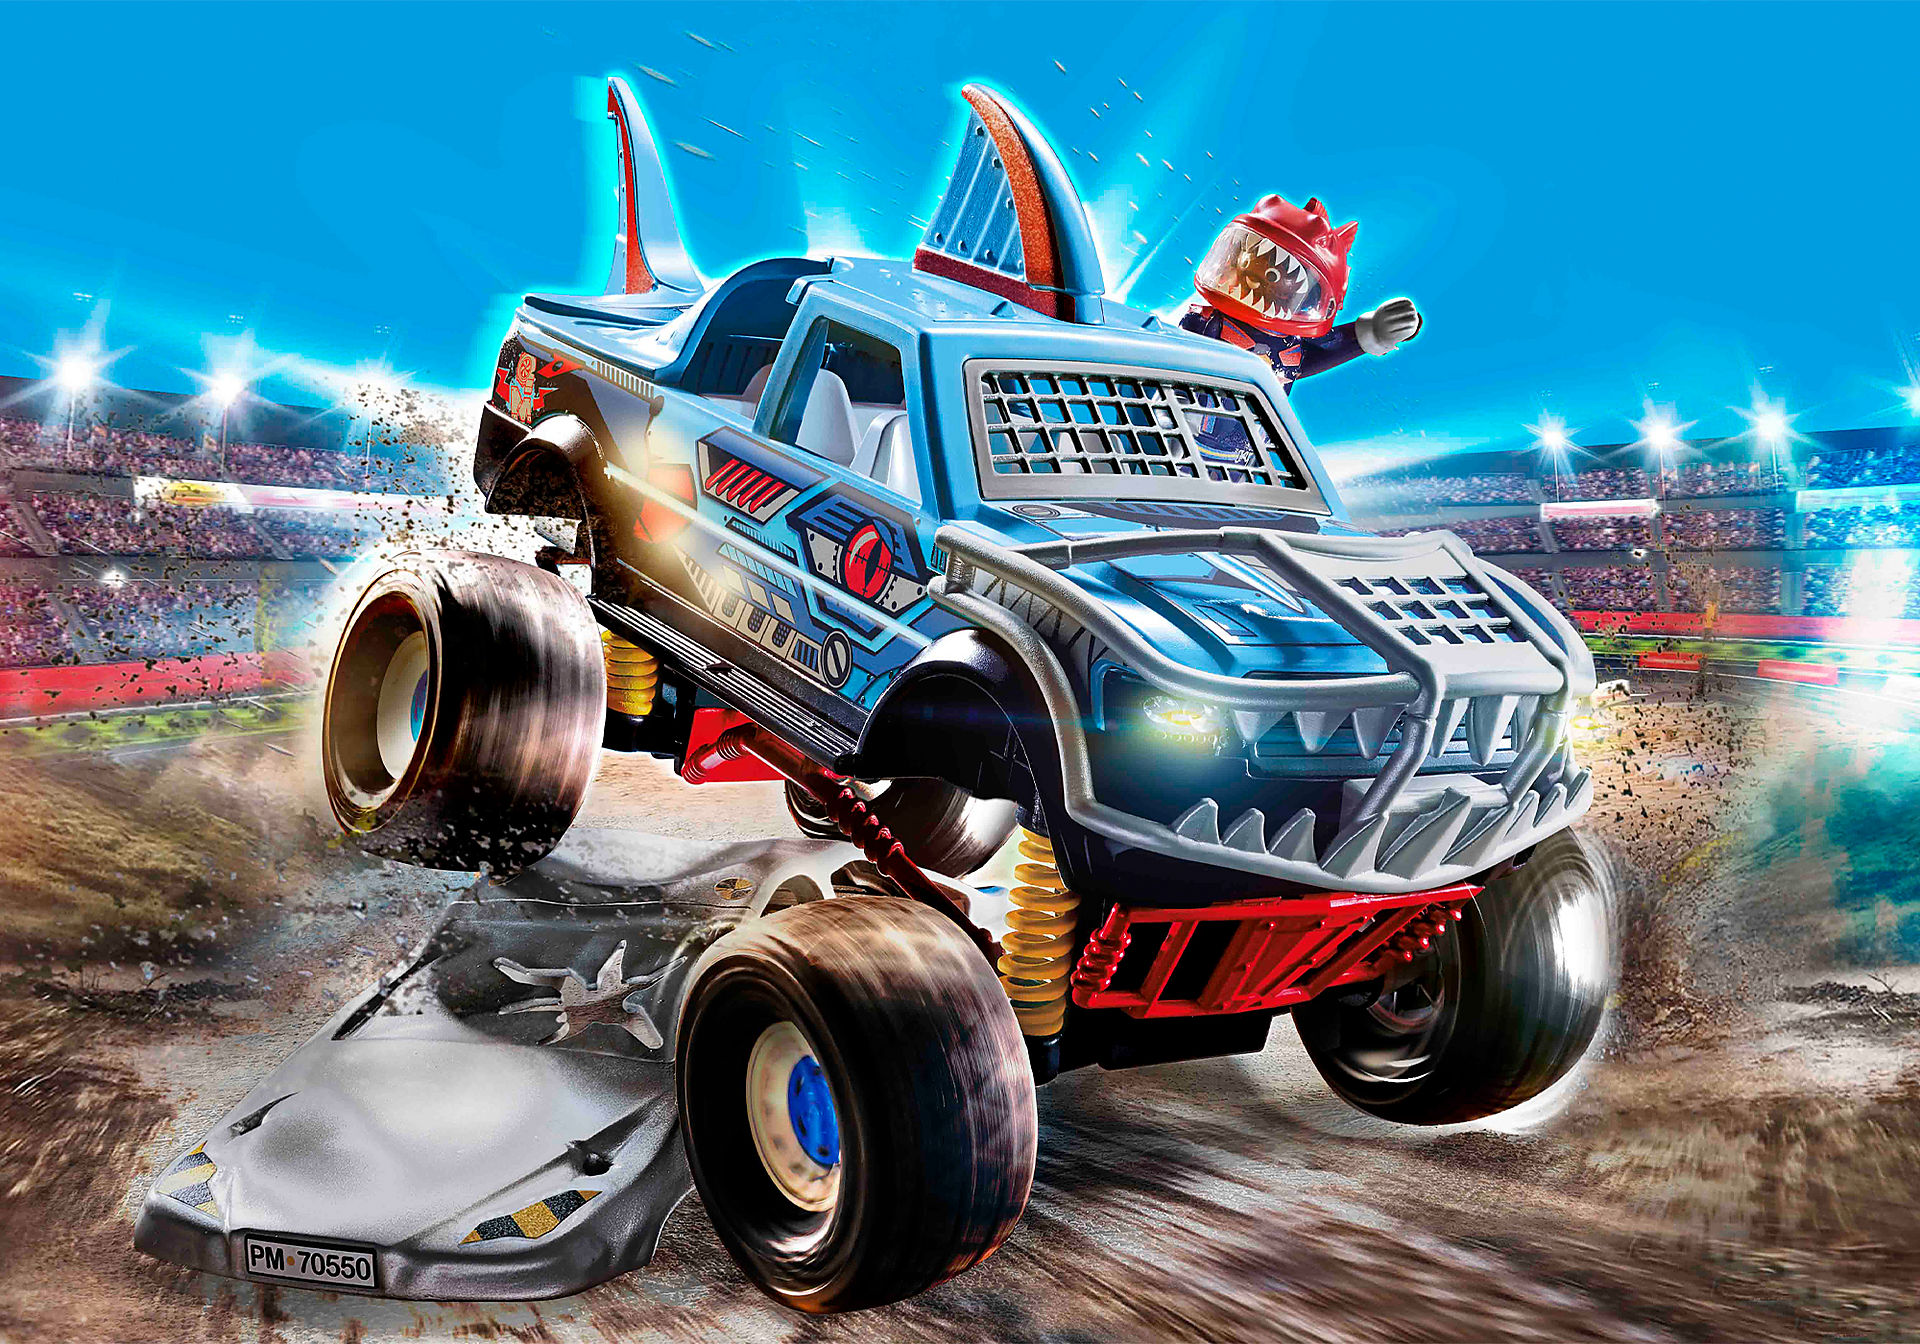 70550 Pokaz kaskaderski: Monster Truck Rekin zoom image1